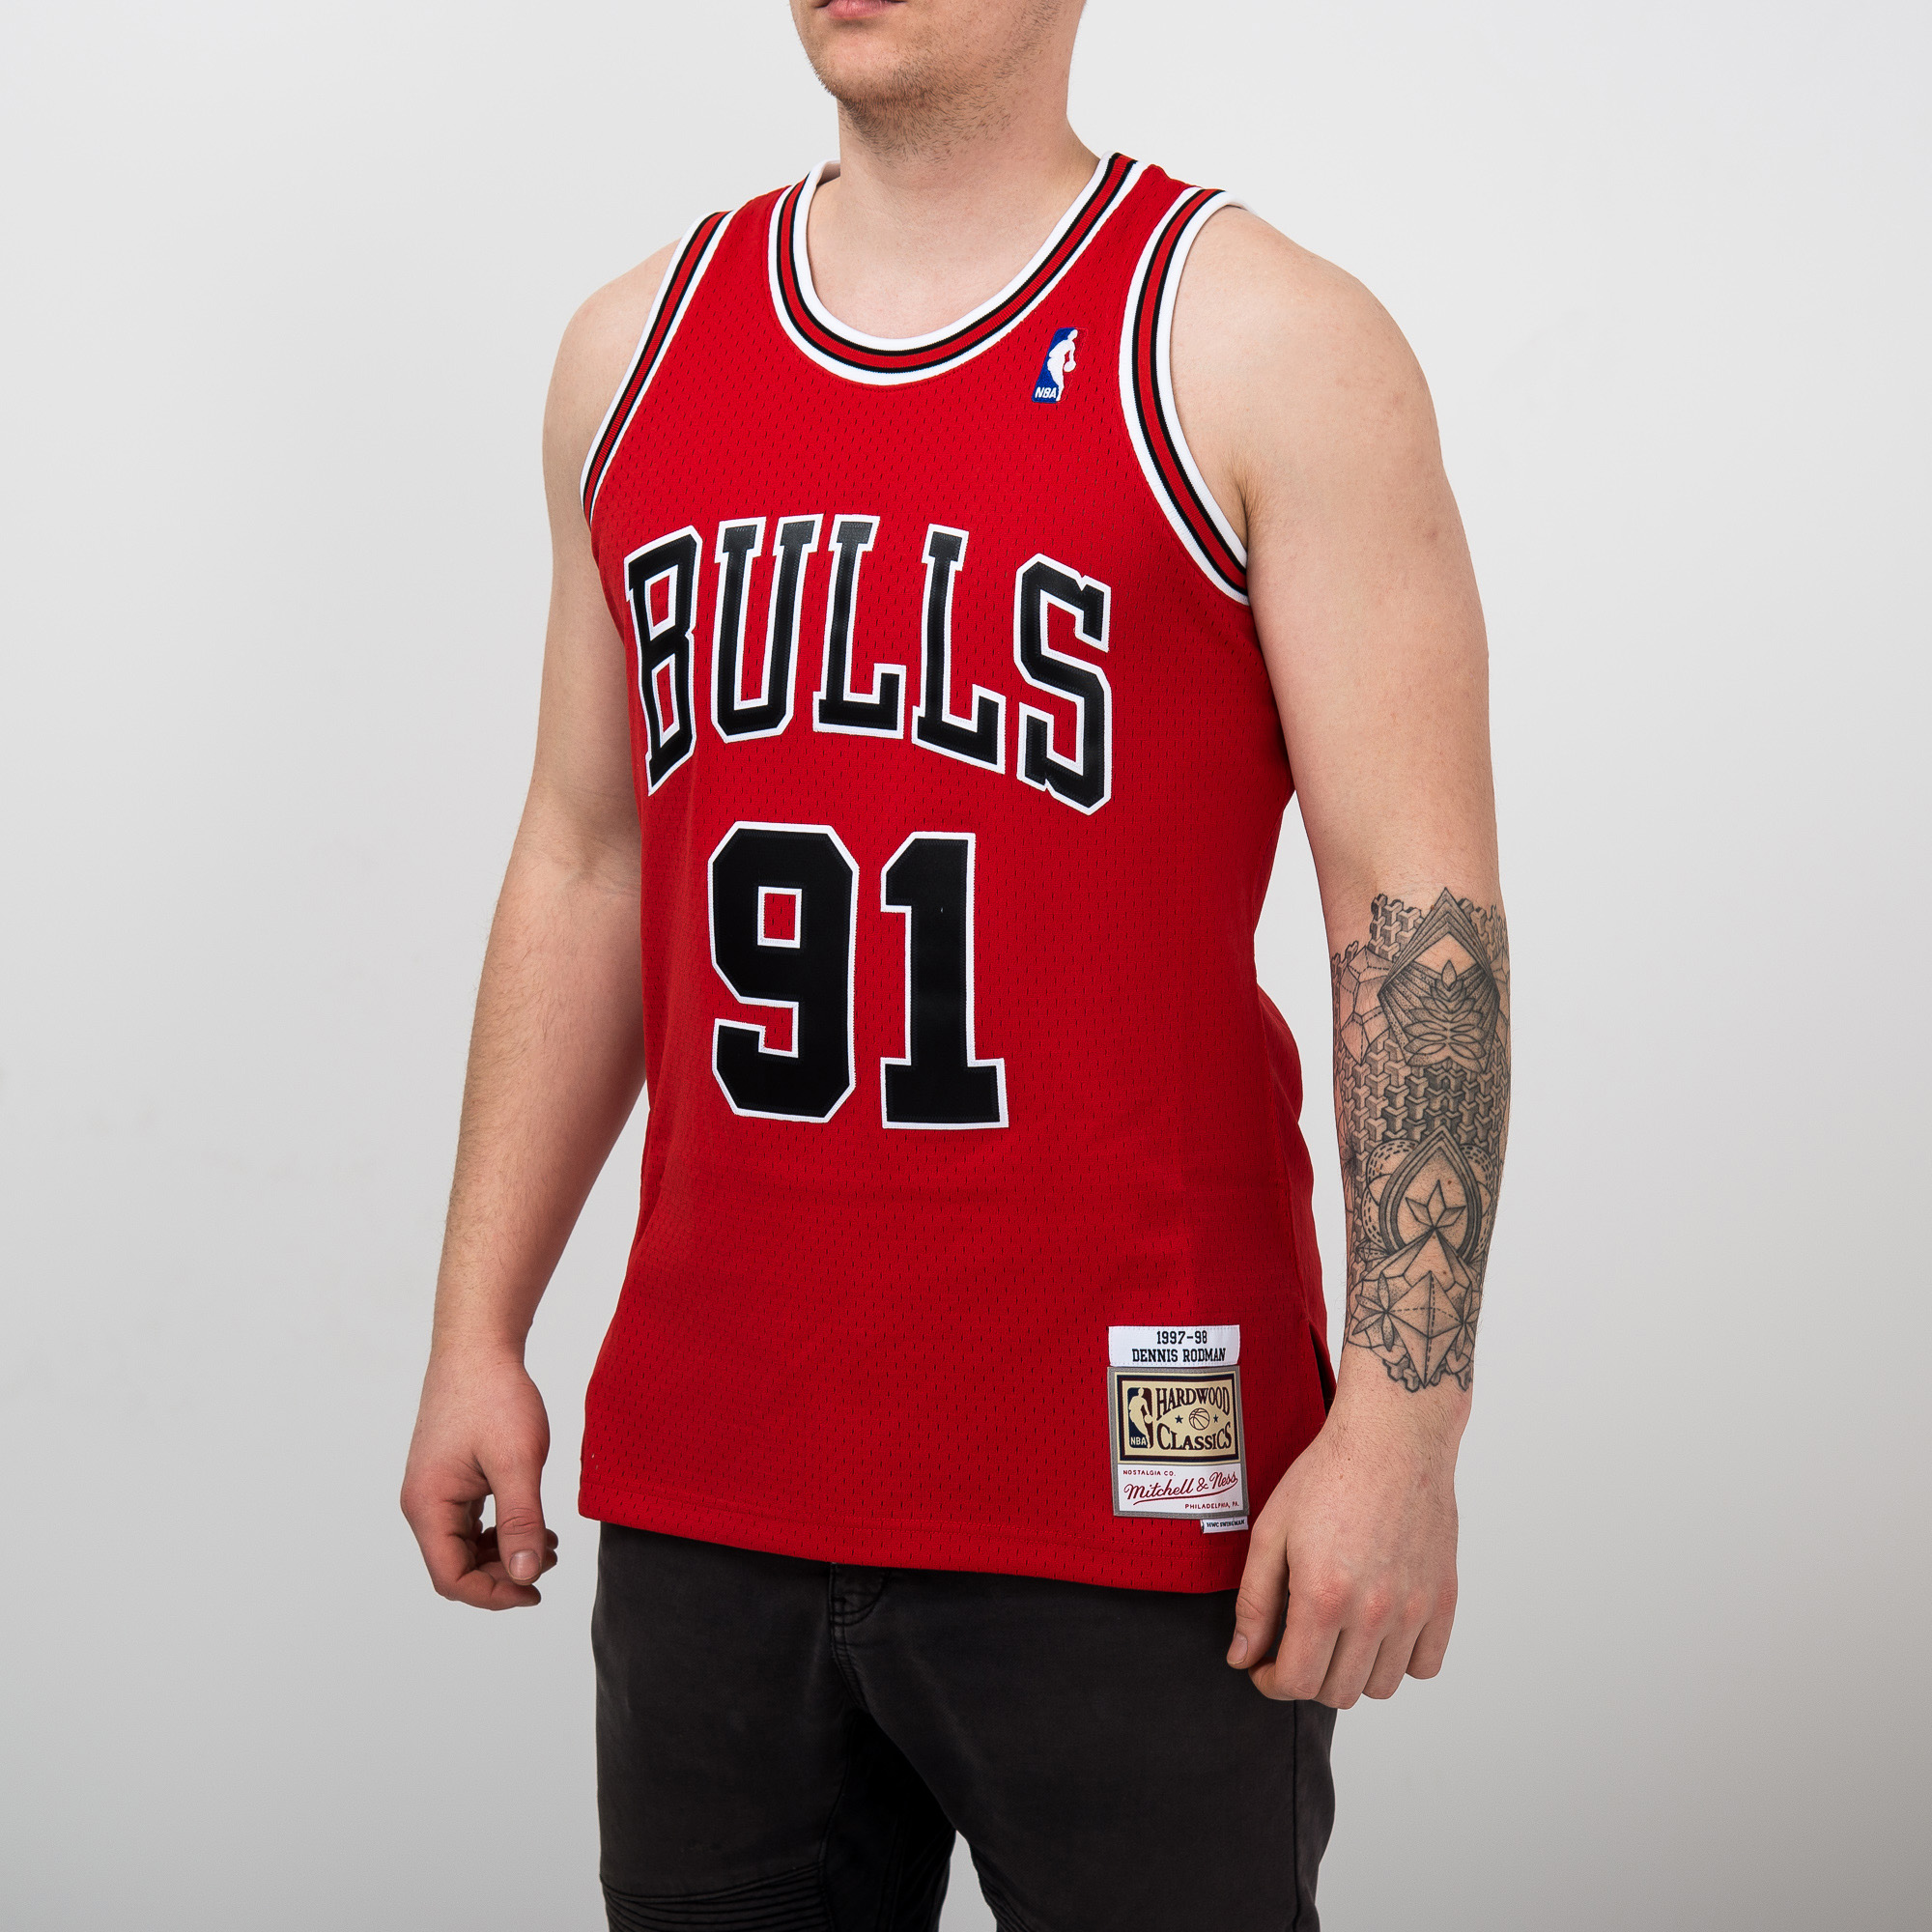 detailing 66163 0cab3 Mitchell & Ness NBA Chicago Bulls Dennis Rodman 1997-98 Road ...